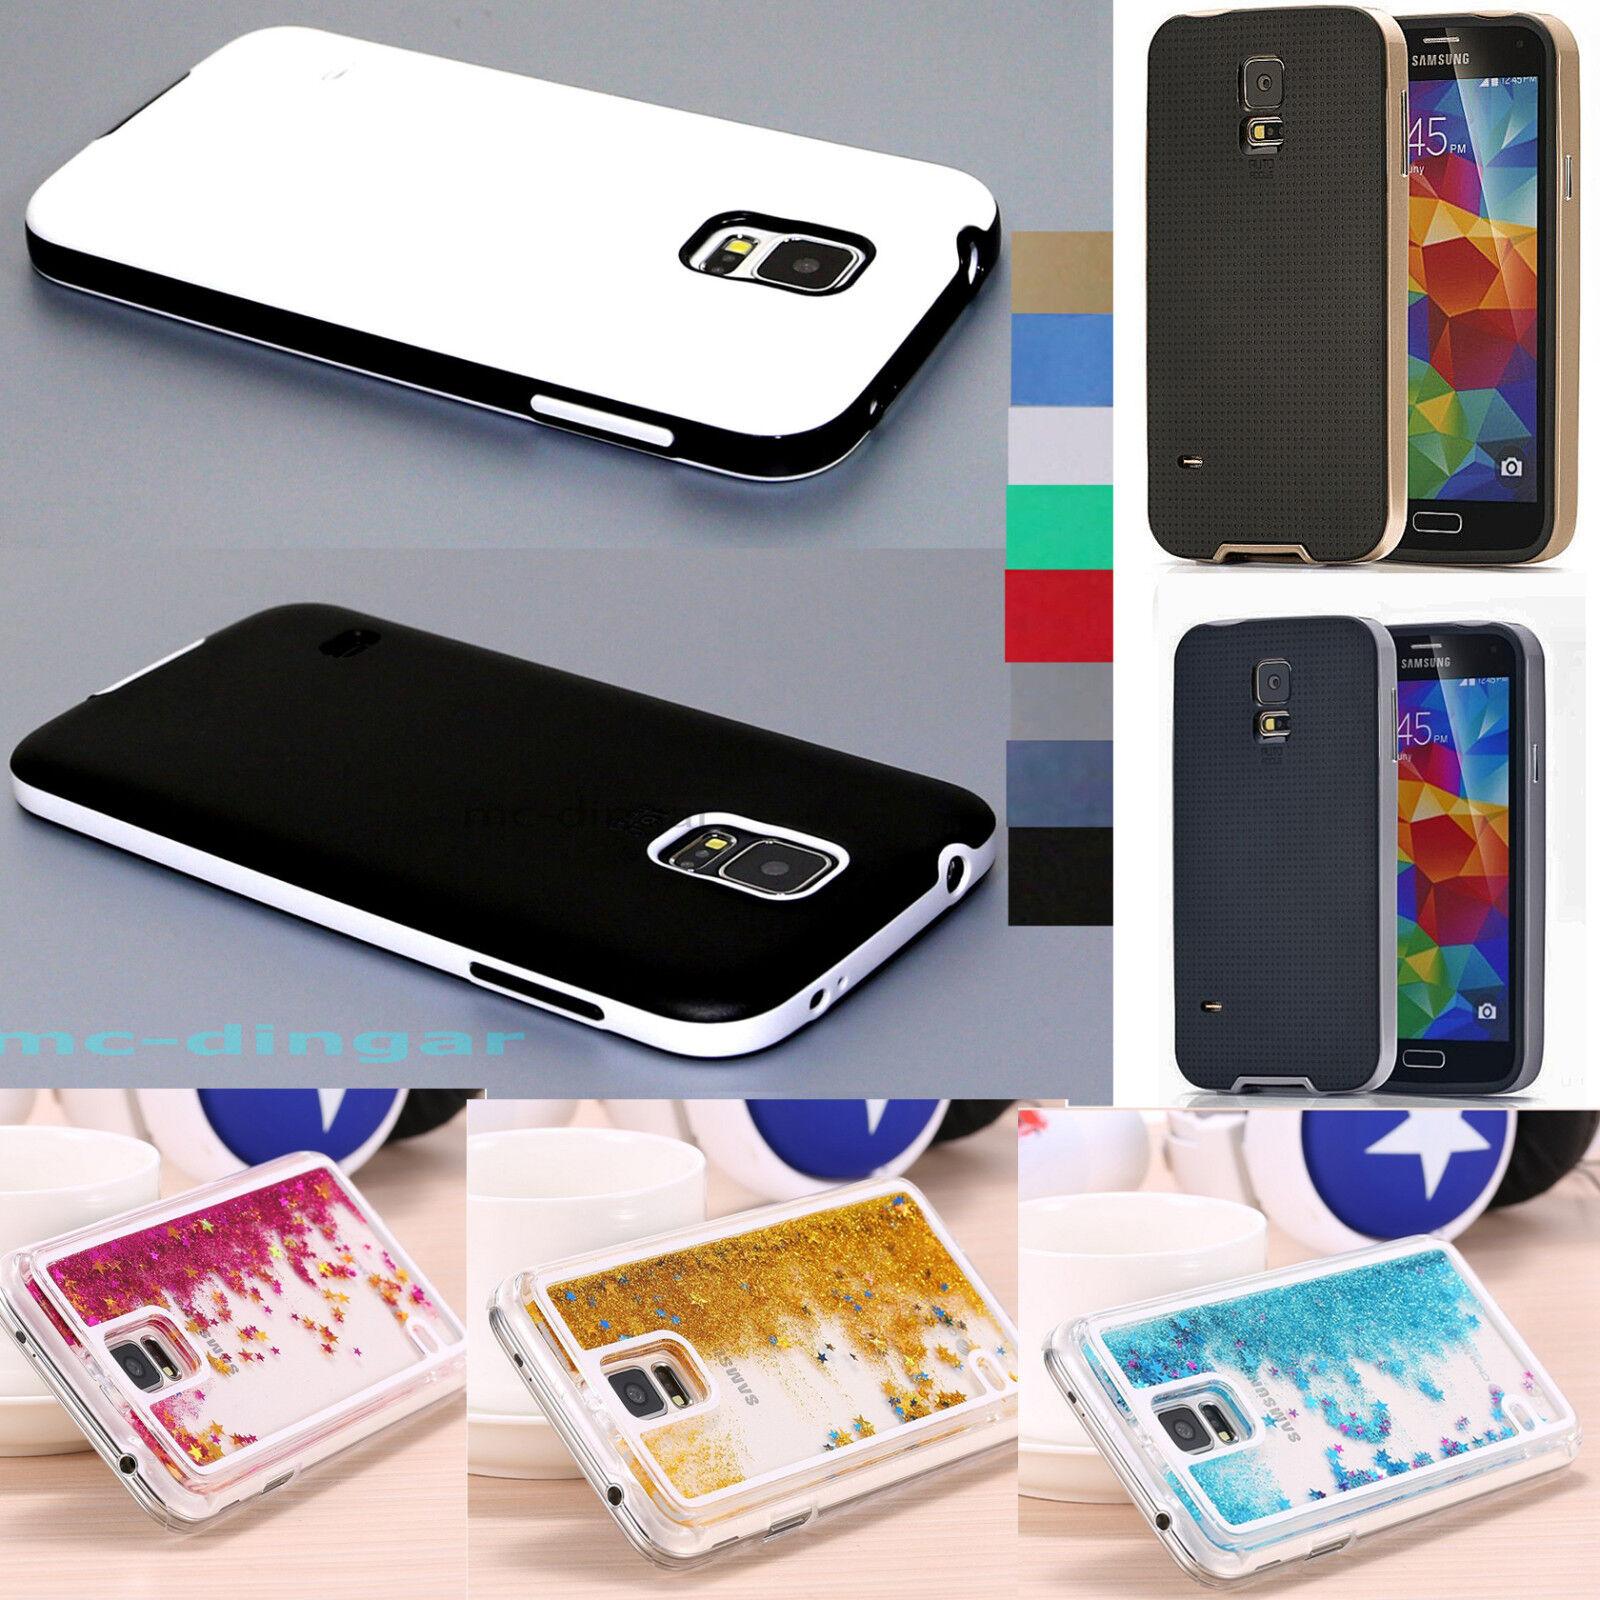 Ultra-Thin Soft Rubber Matte Bumper Case Cover For Samsung Galaxy S5 i9600